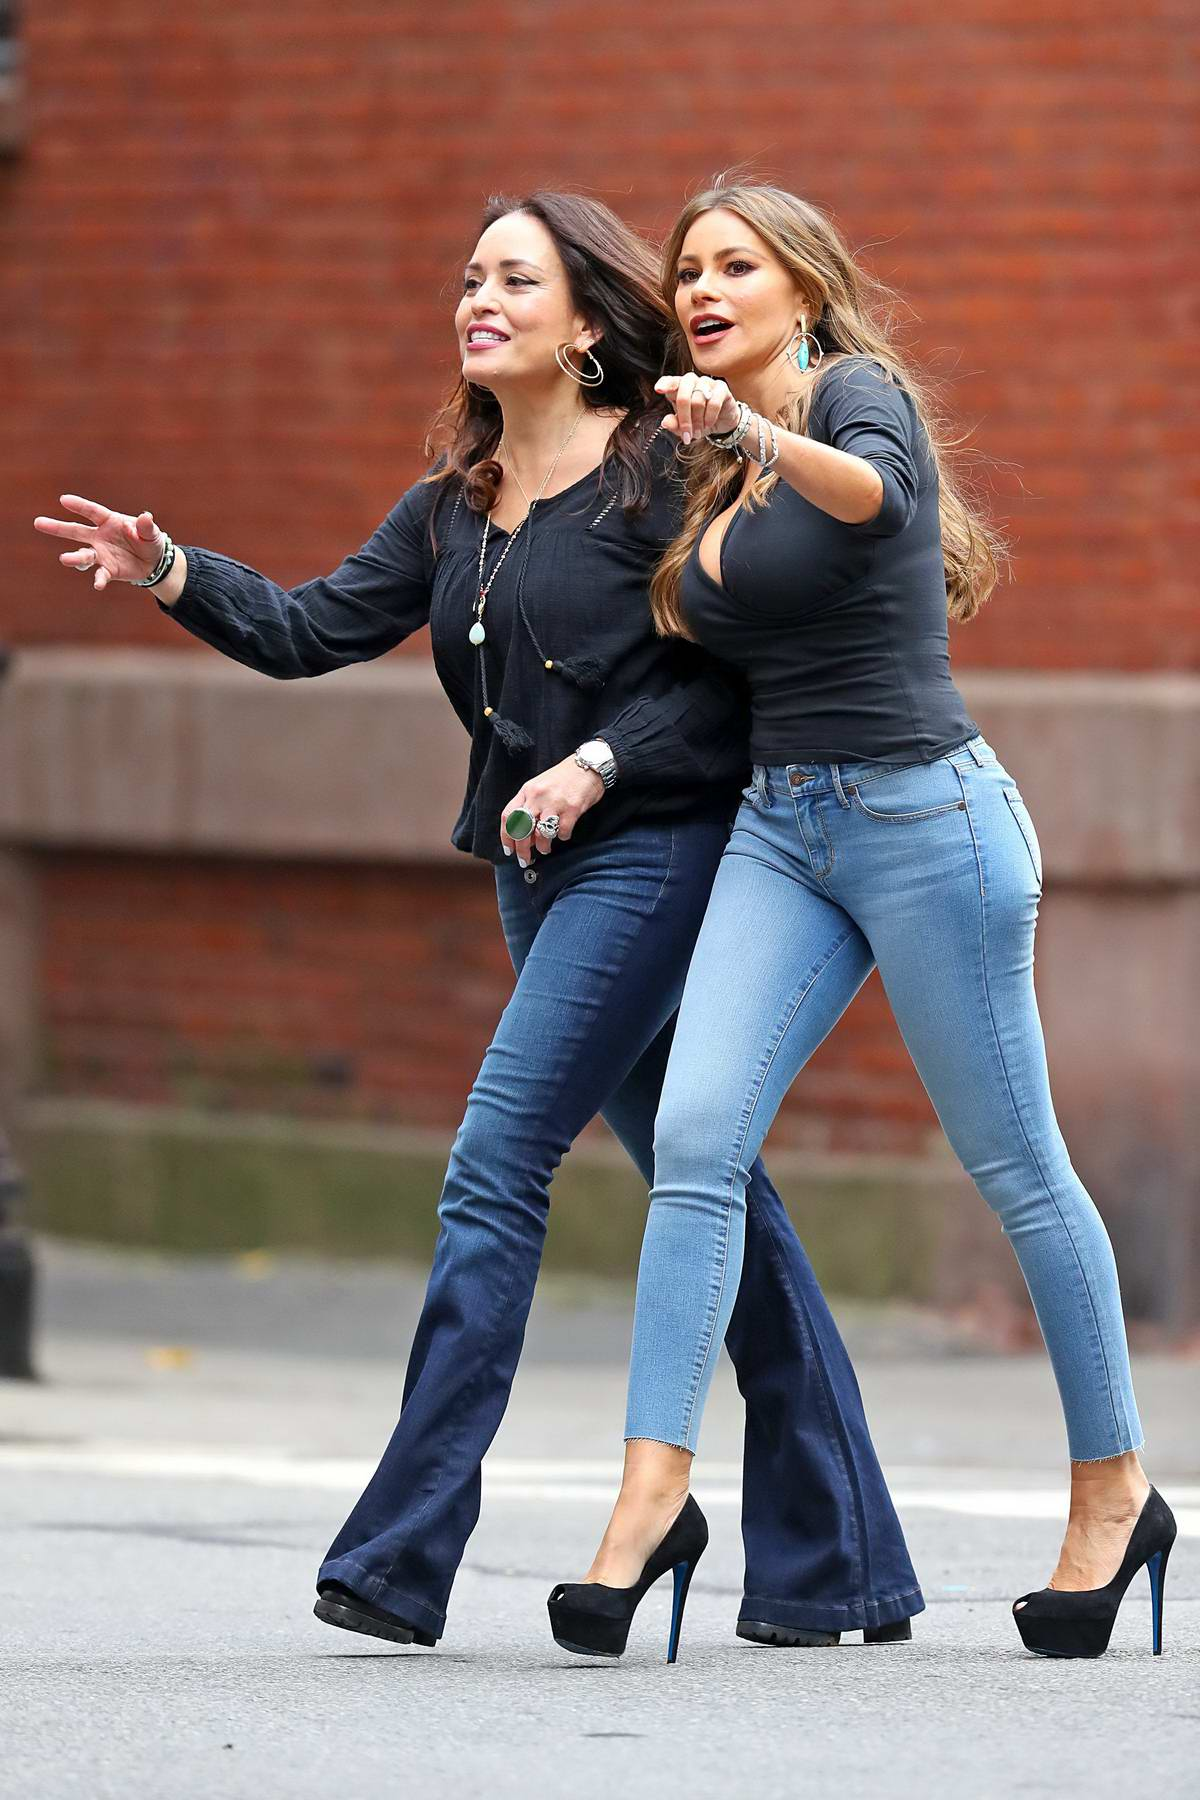 Sofia Vergara Seen Wearing A Formfitting Top Skinny Jeans